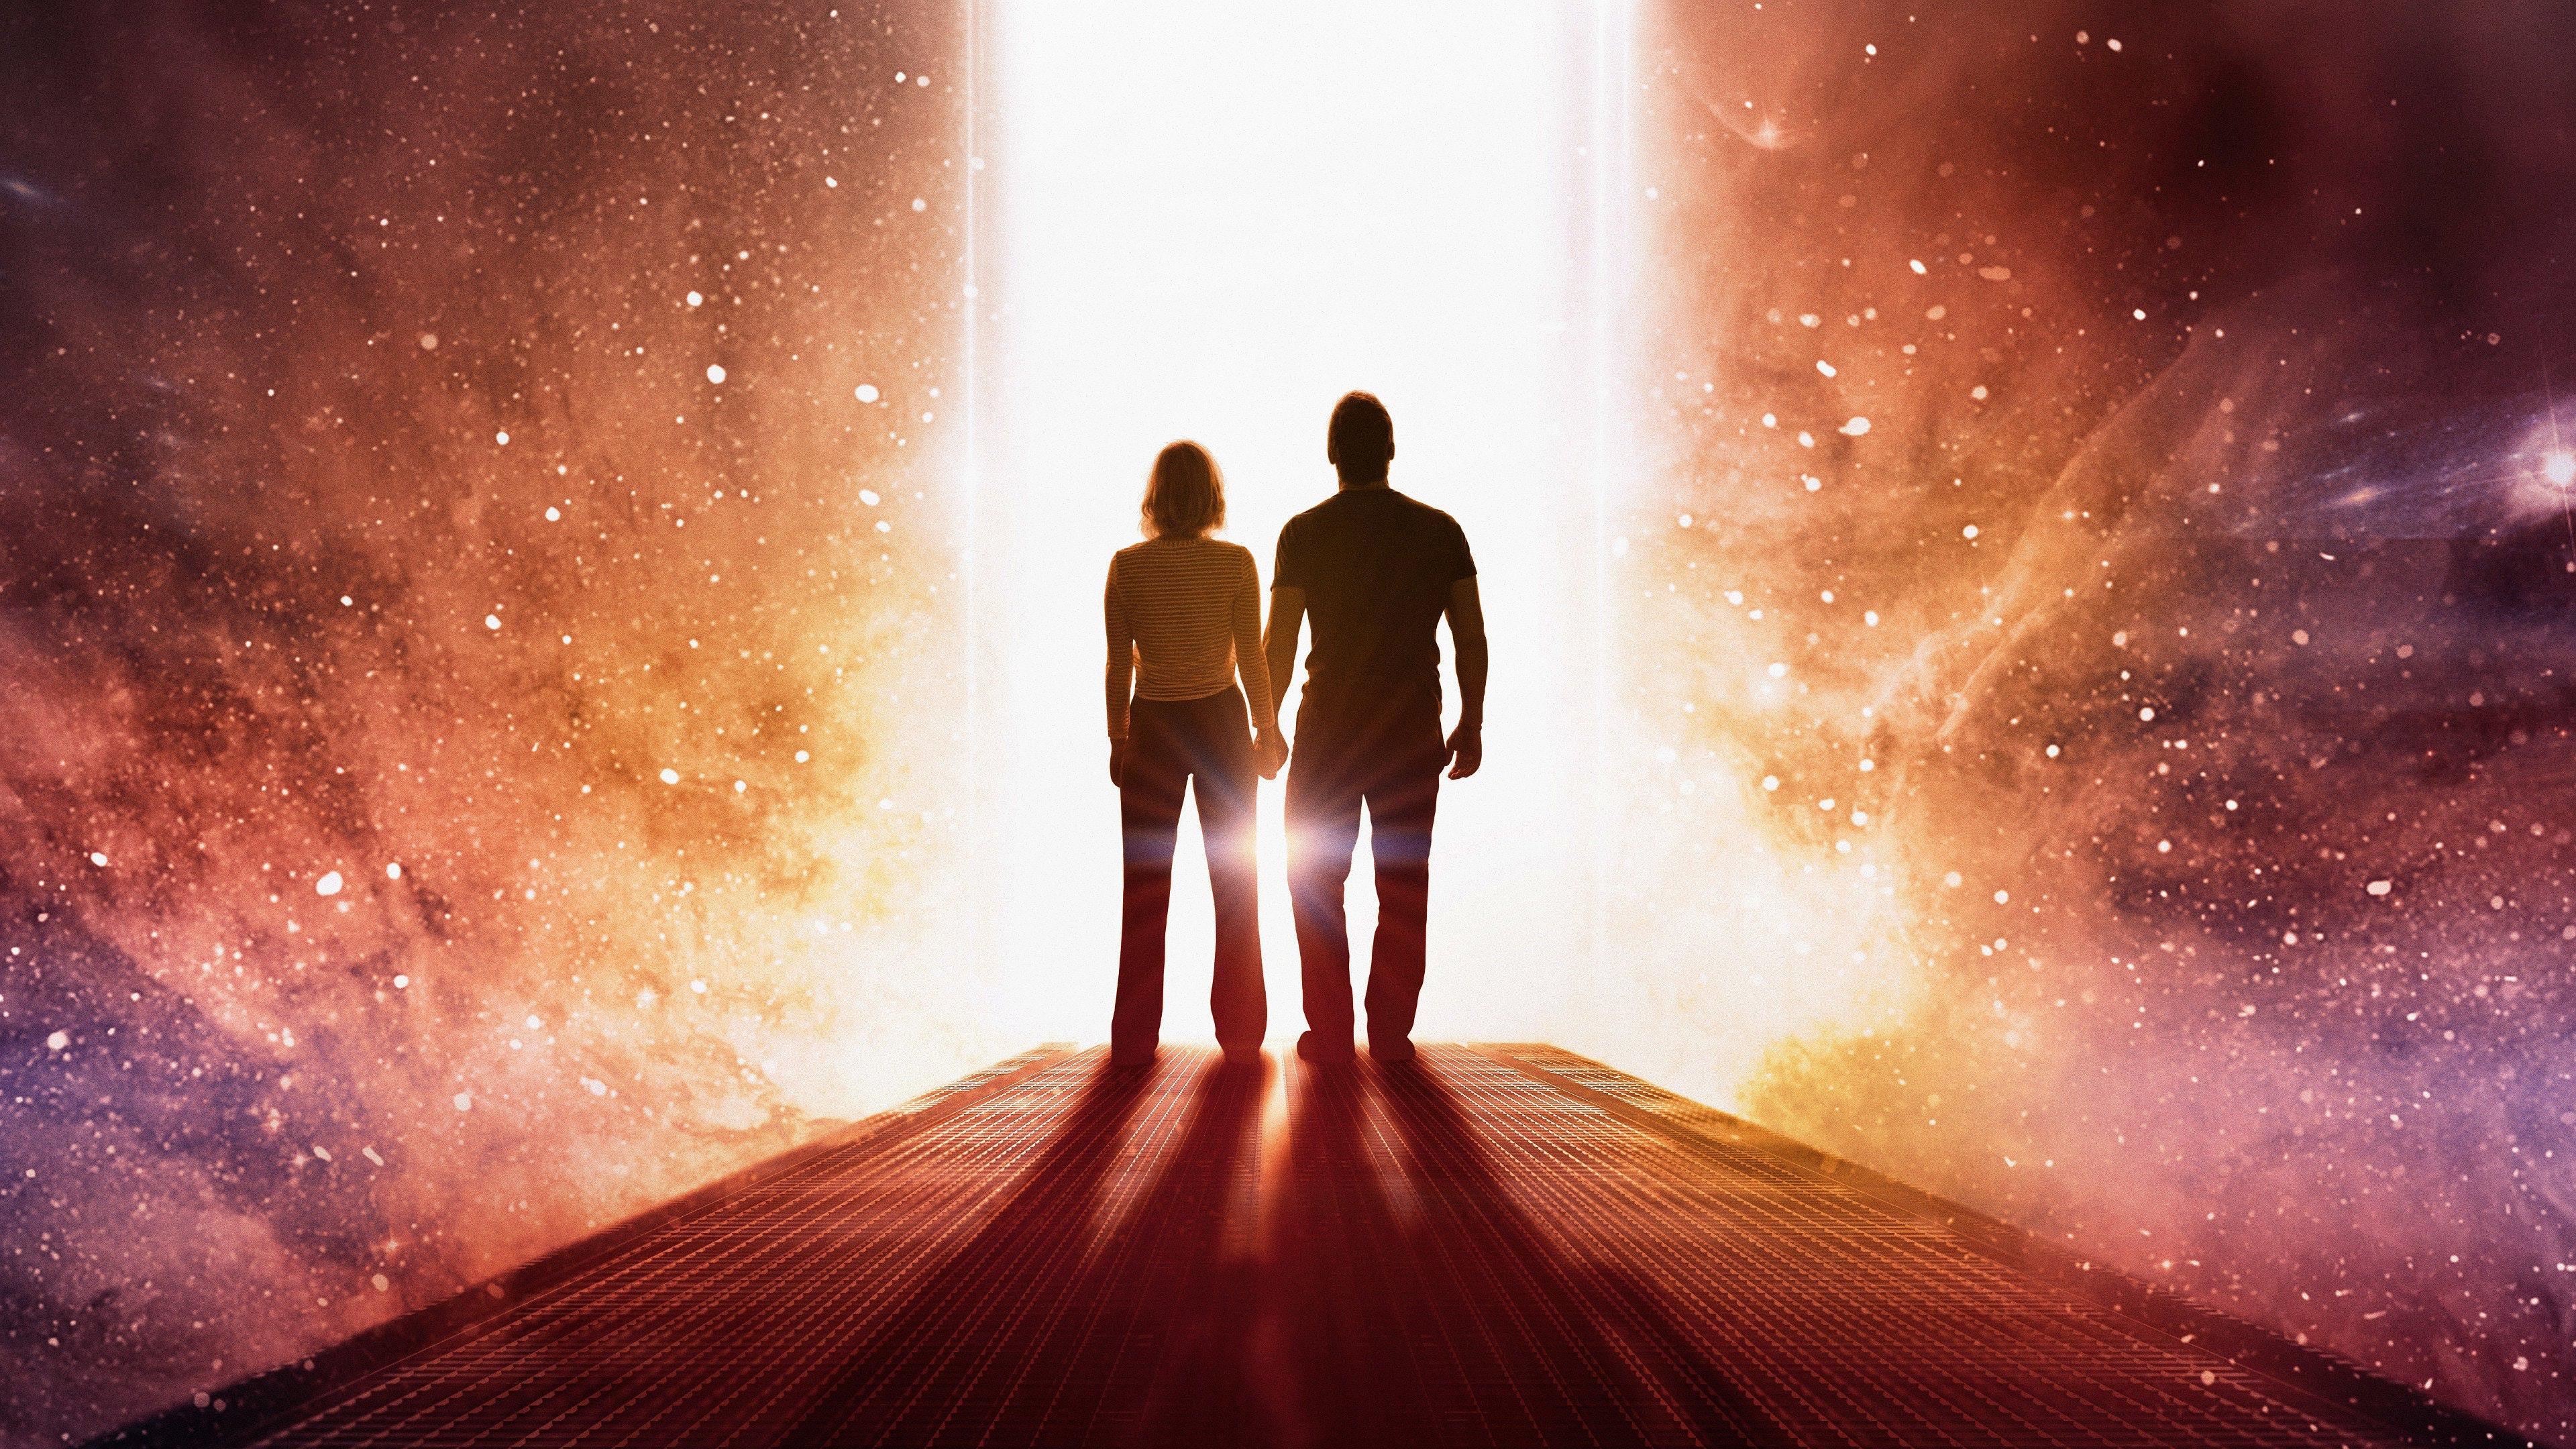 Passengers (2016) Soundtrack